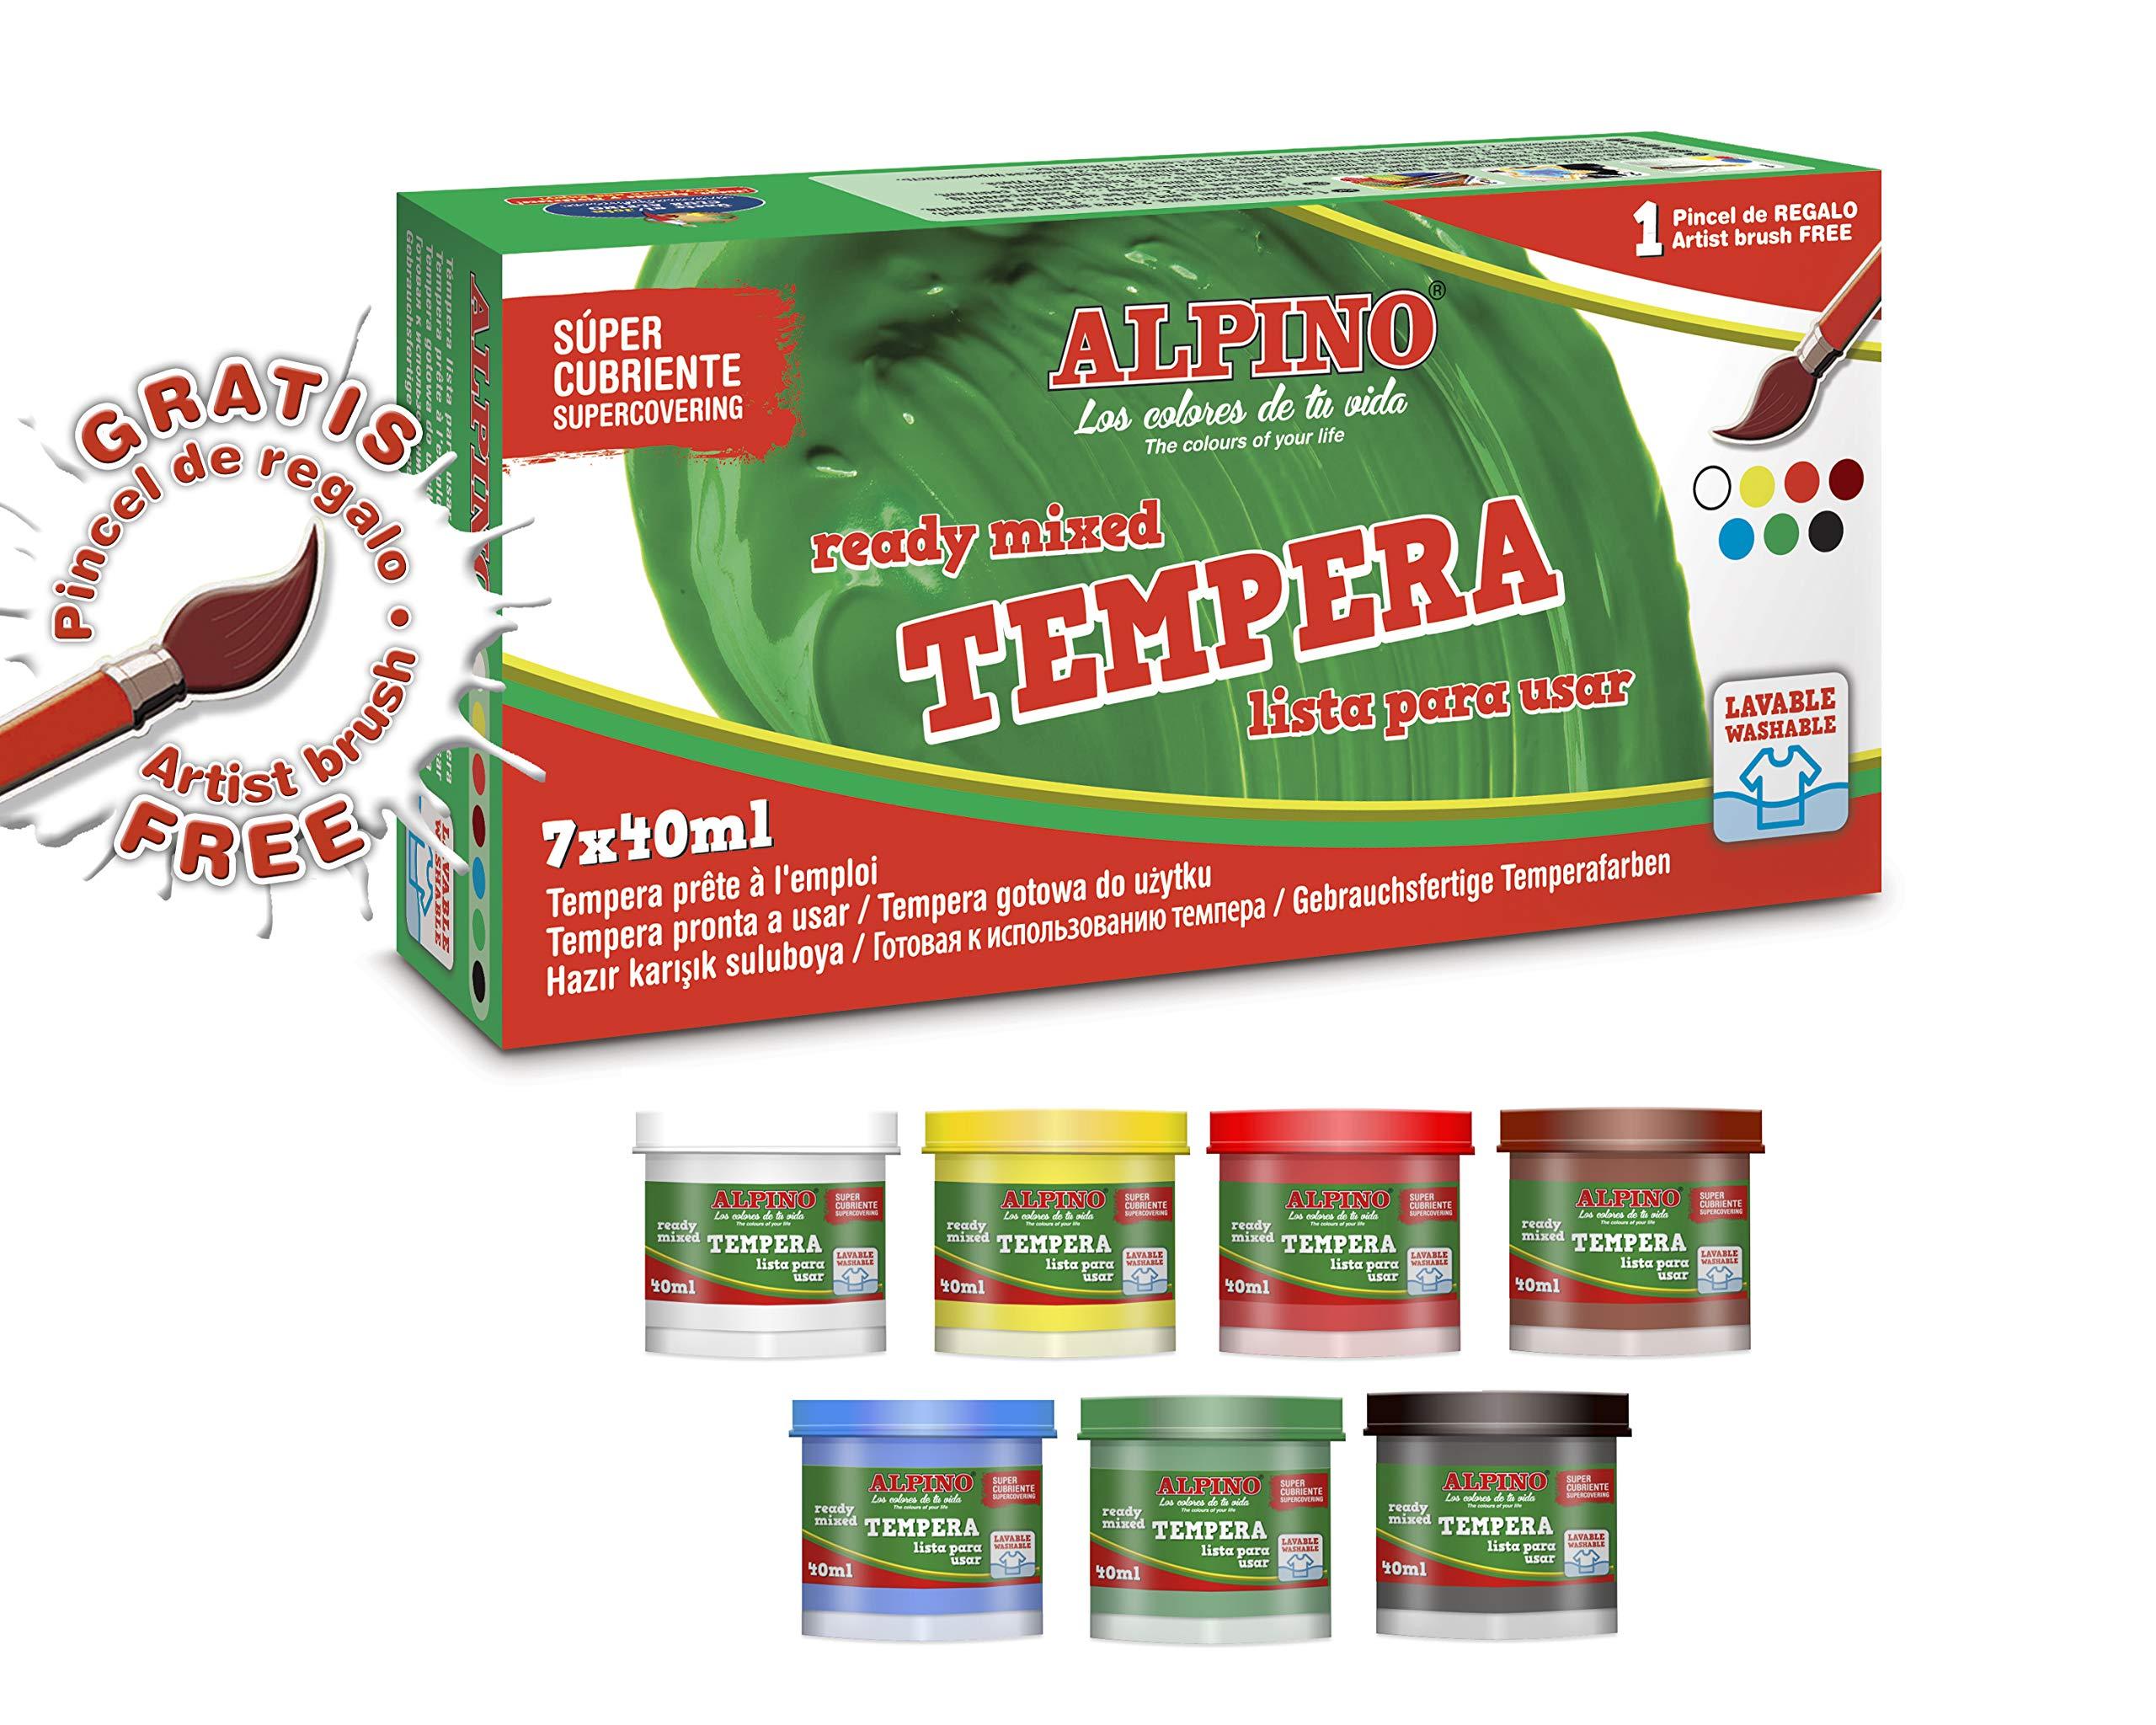 Alpino DM010921 – Tempera